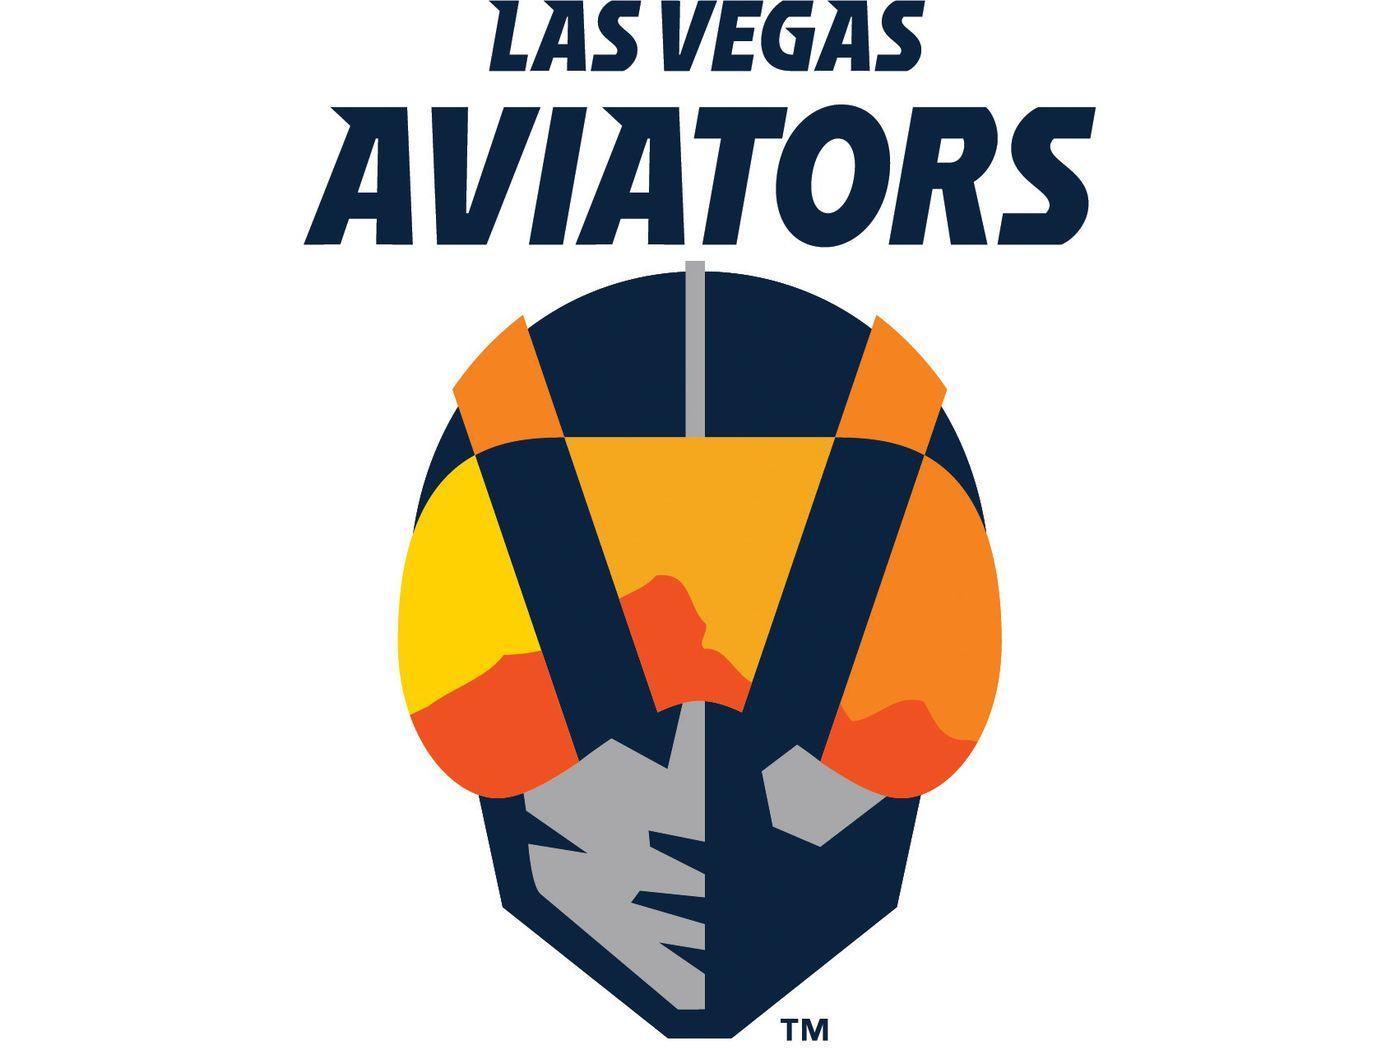 Las Vegas Aviators company logo